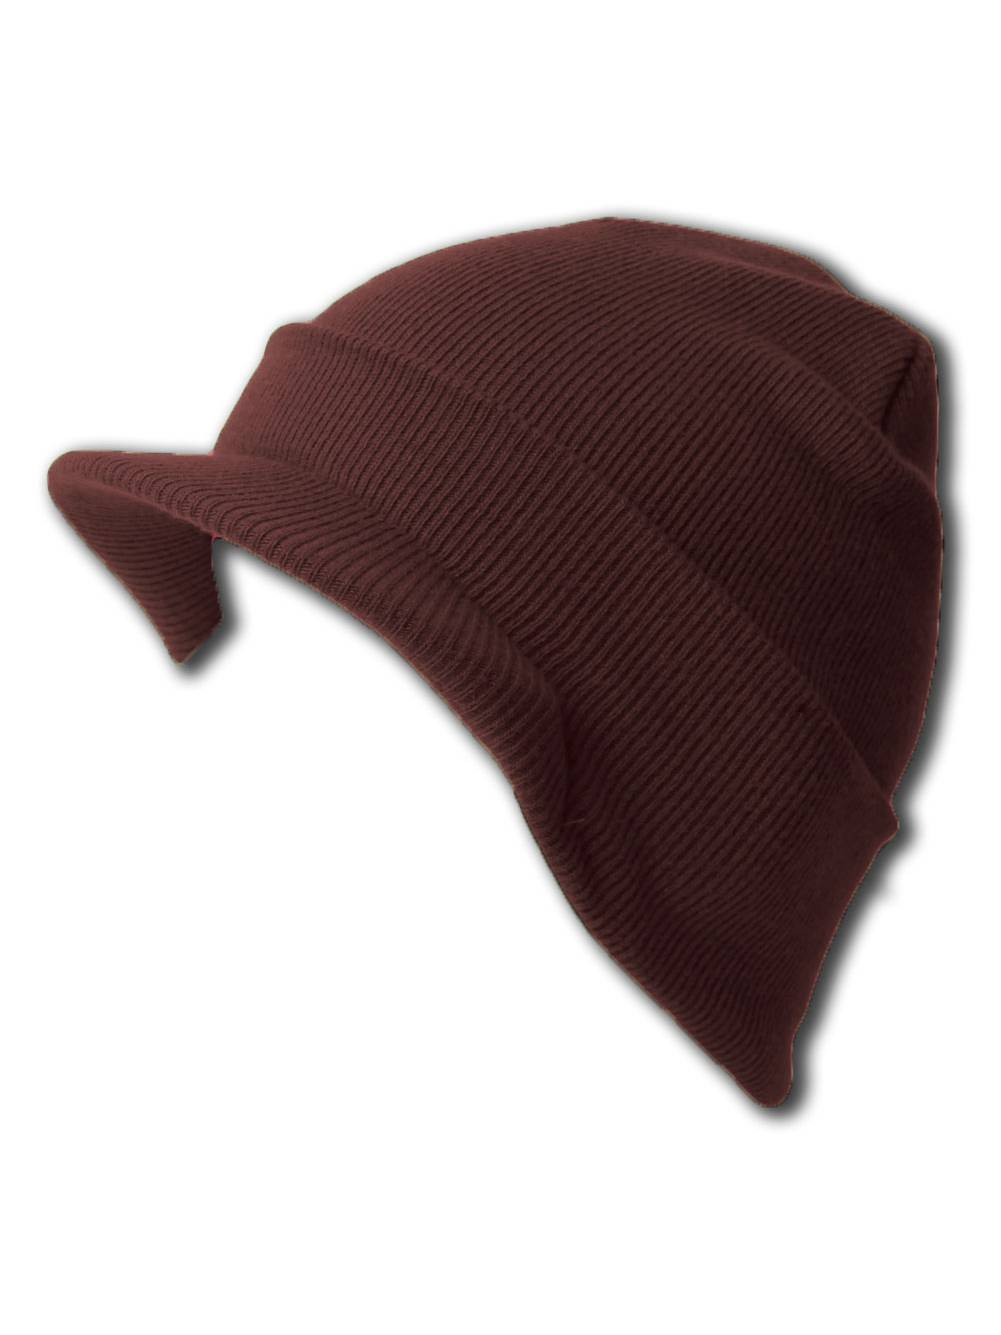 79da5360bfd NEW CUFF BROWN Beanie Visor Skull Cap HAT